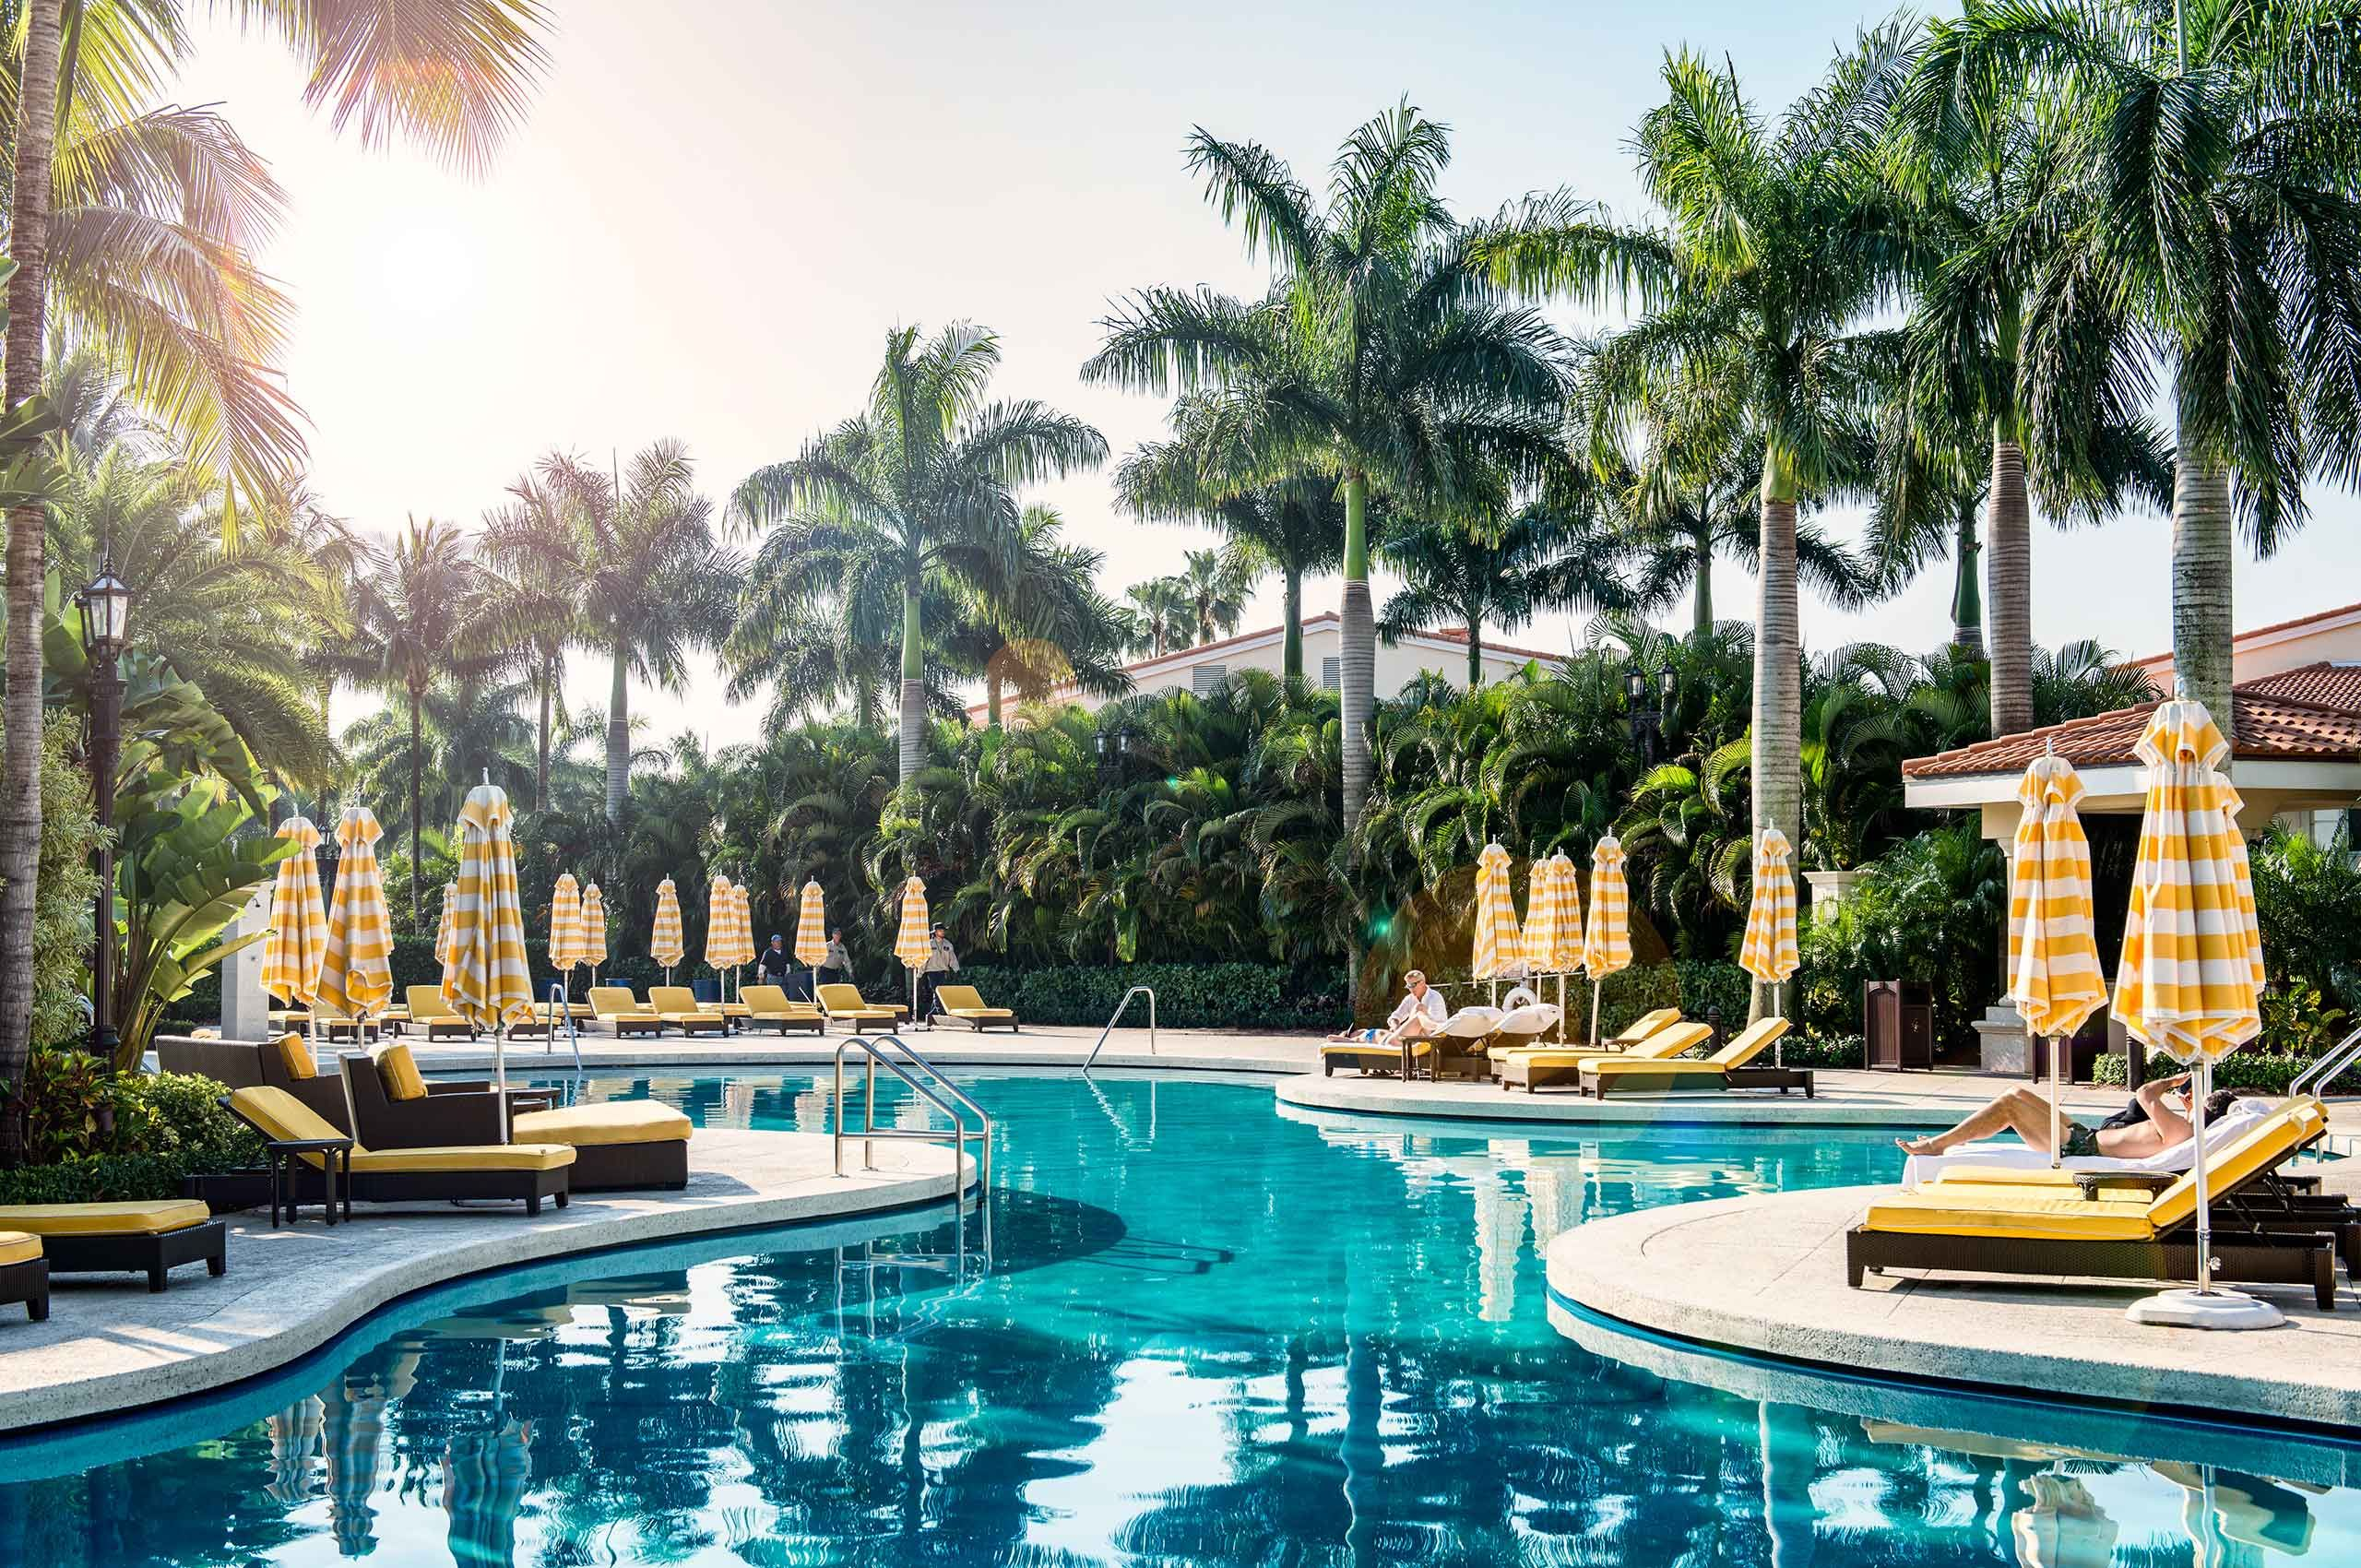 HotelPool-Luxury-NeverSettle-by-HenrikOlundPhotography.jpg